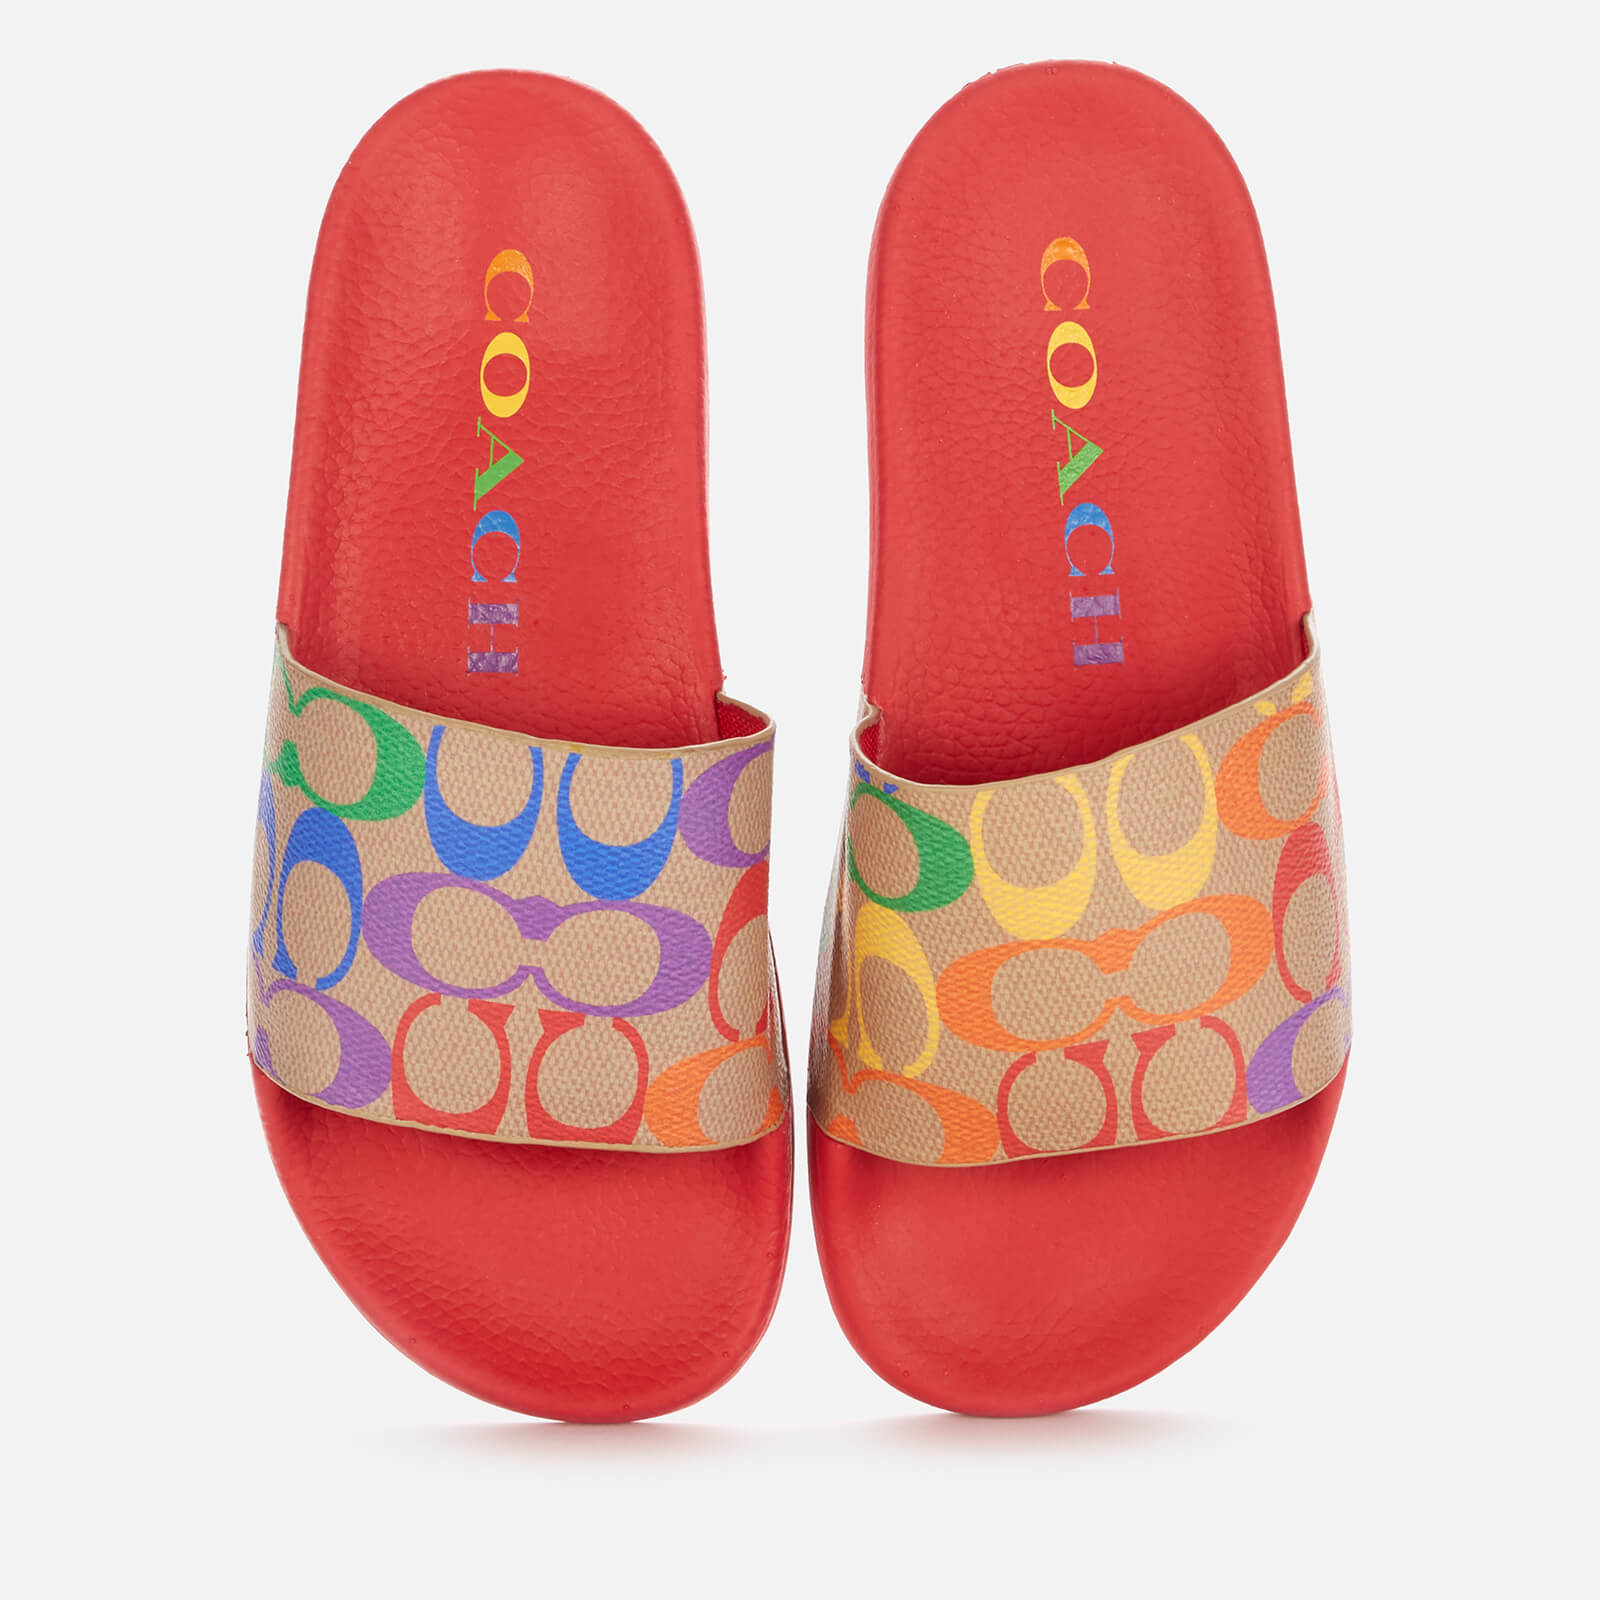 Coach Women's Pride Rubber Pool Slide Sandals - Chalk Multi - Uk 4